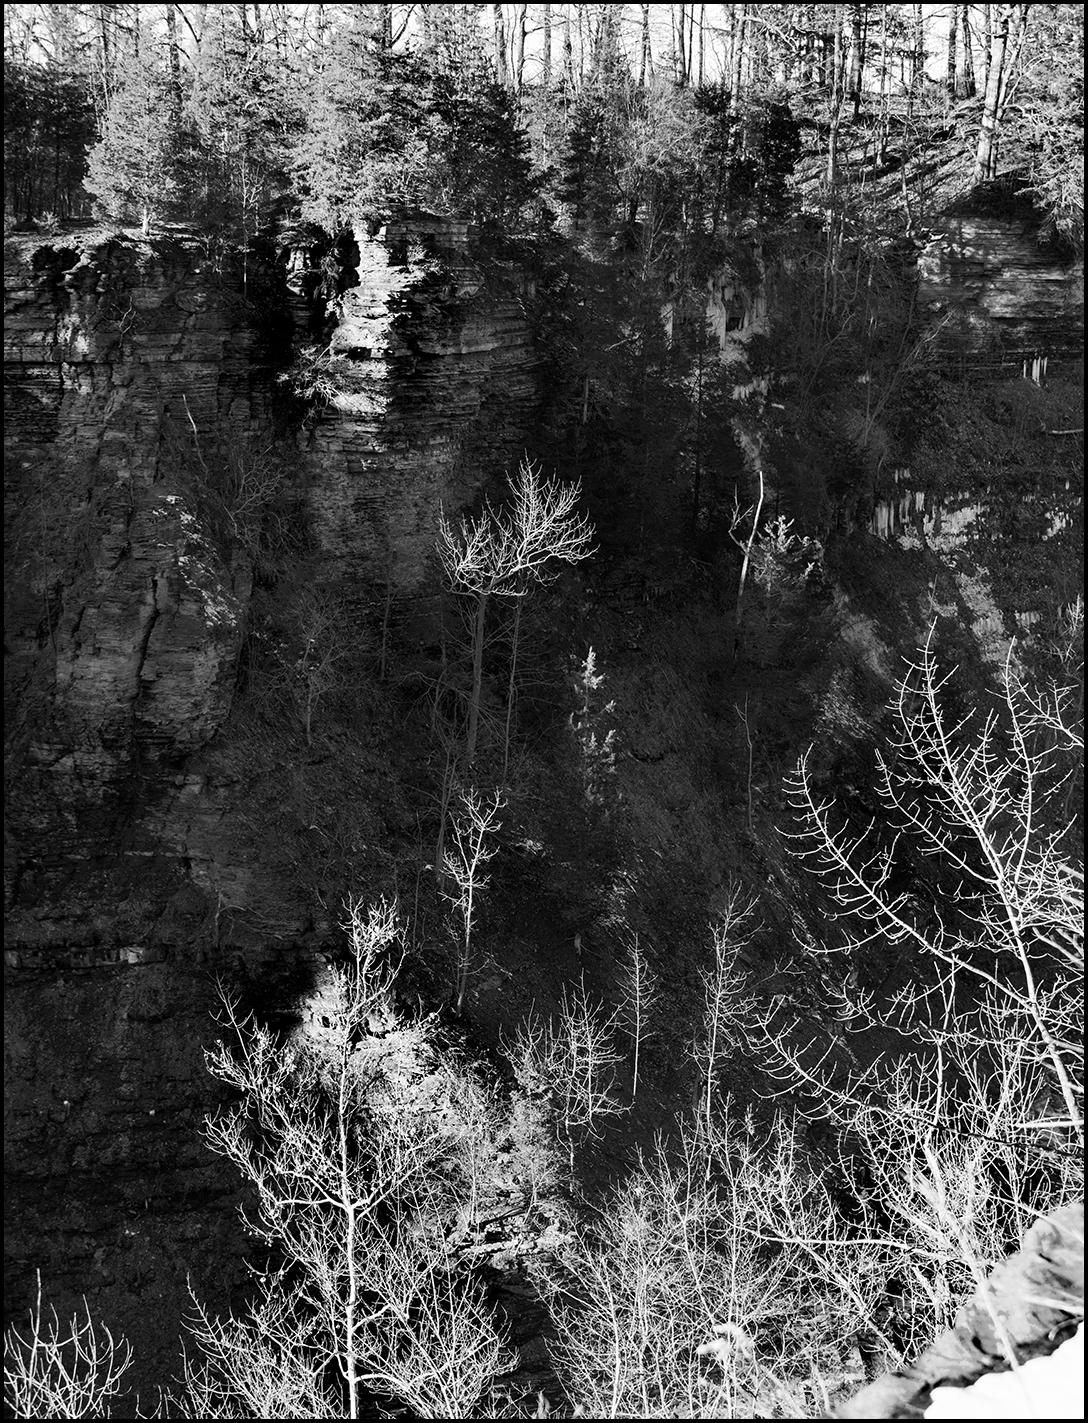 Gorge - 11 +.jpg